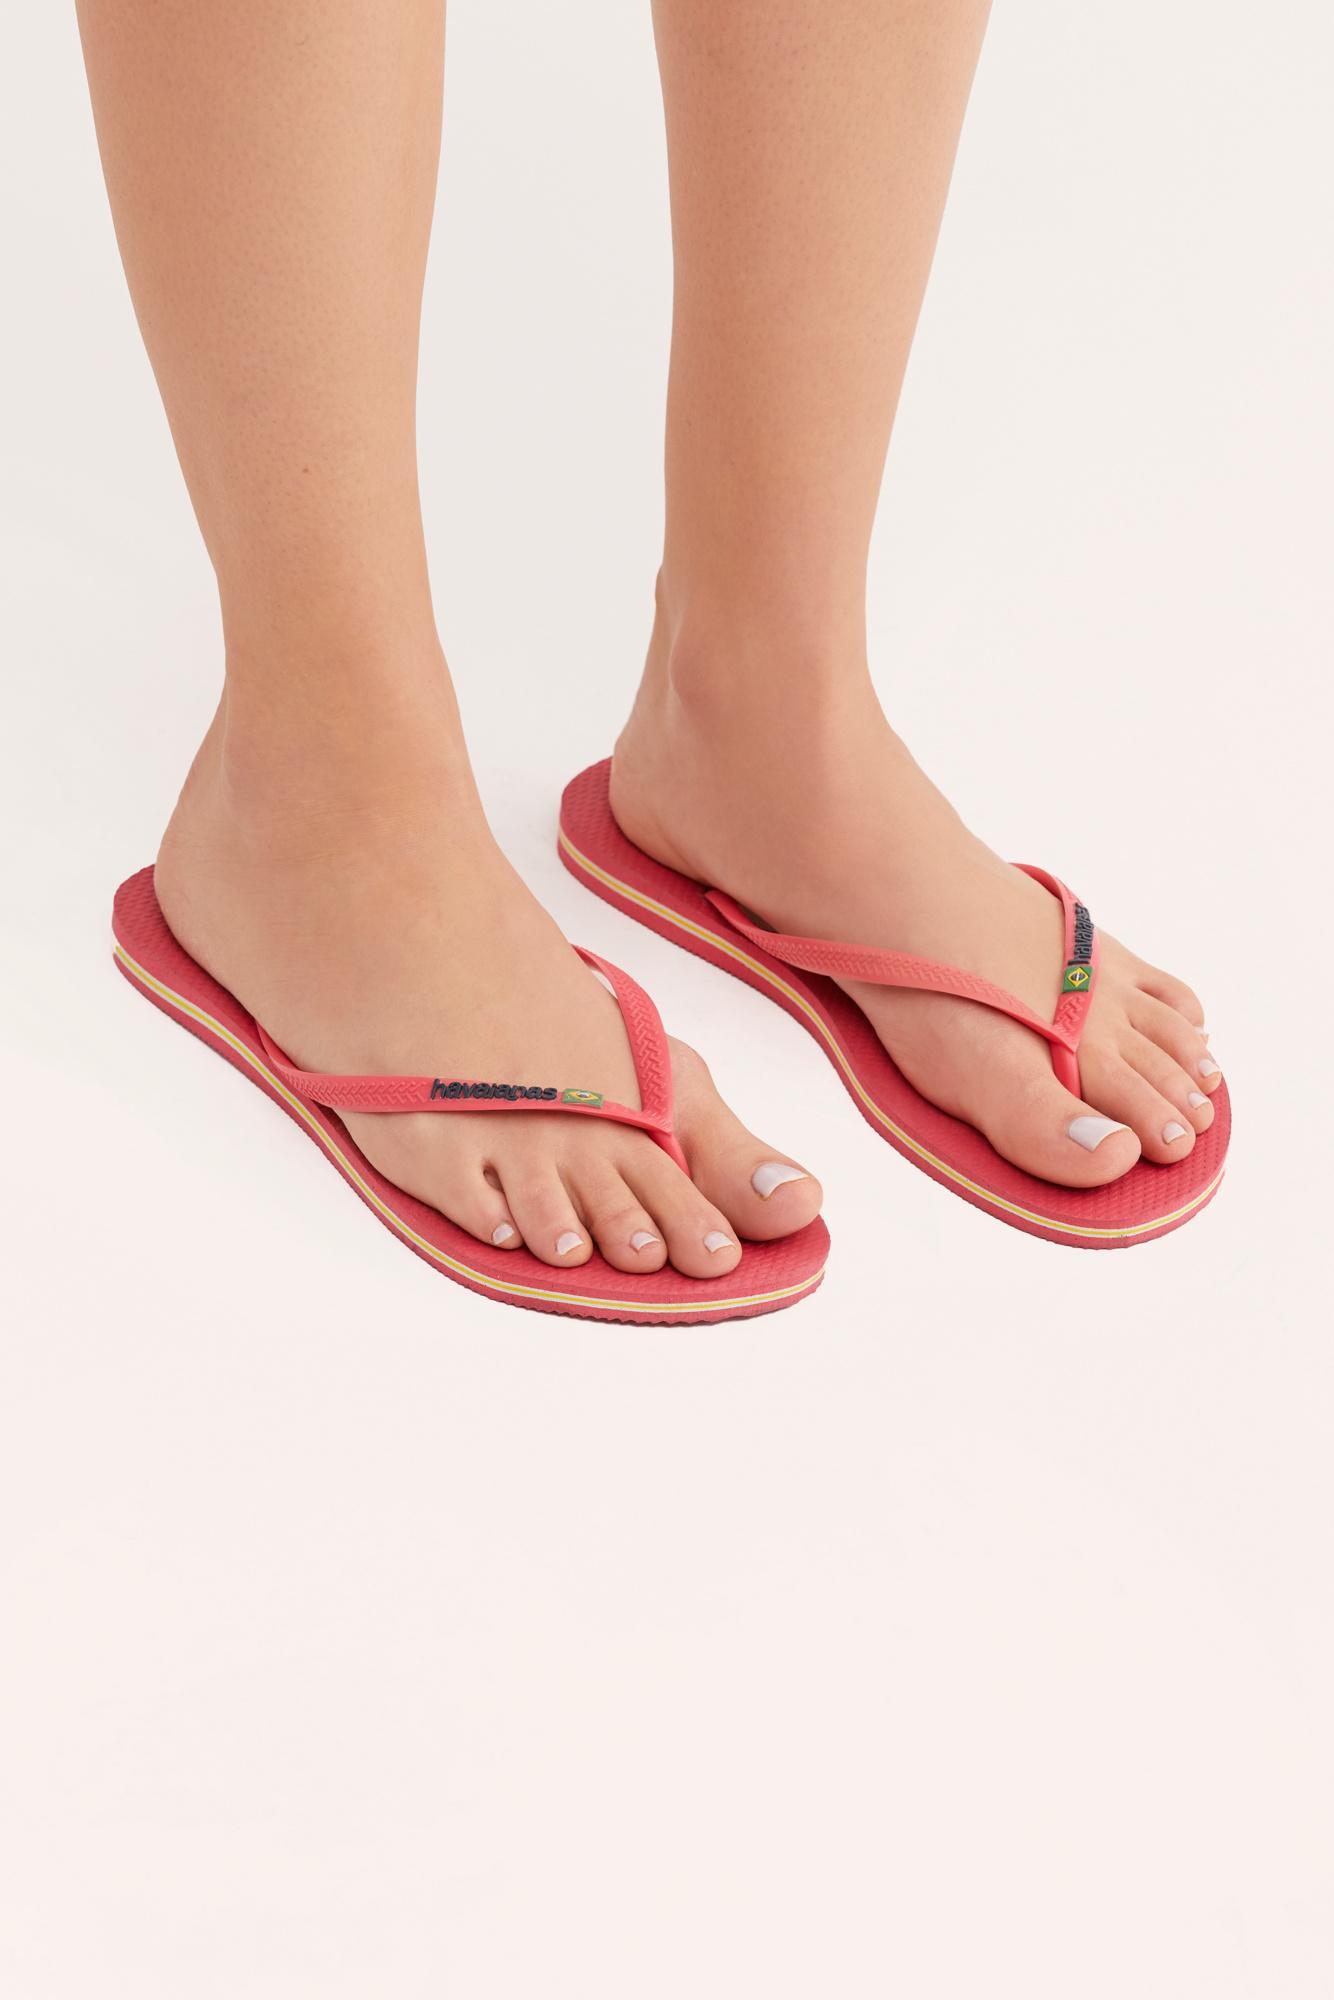 9518ff6b8b613 Free People - Multicolor Havaianas Slim Brazil Flip Flop Sandal - Lyst.  View fullscreen